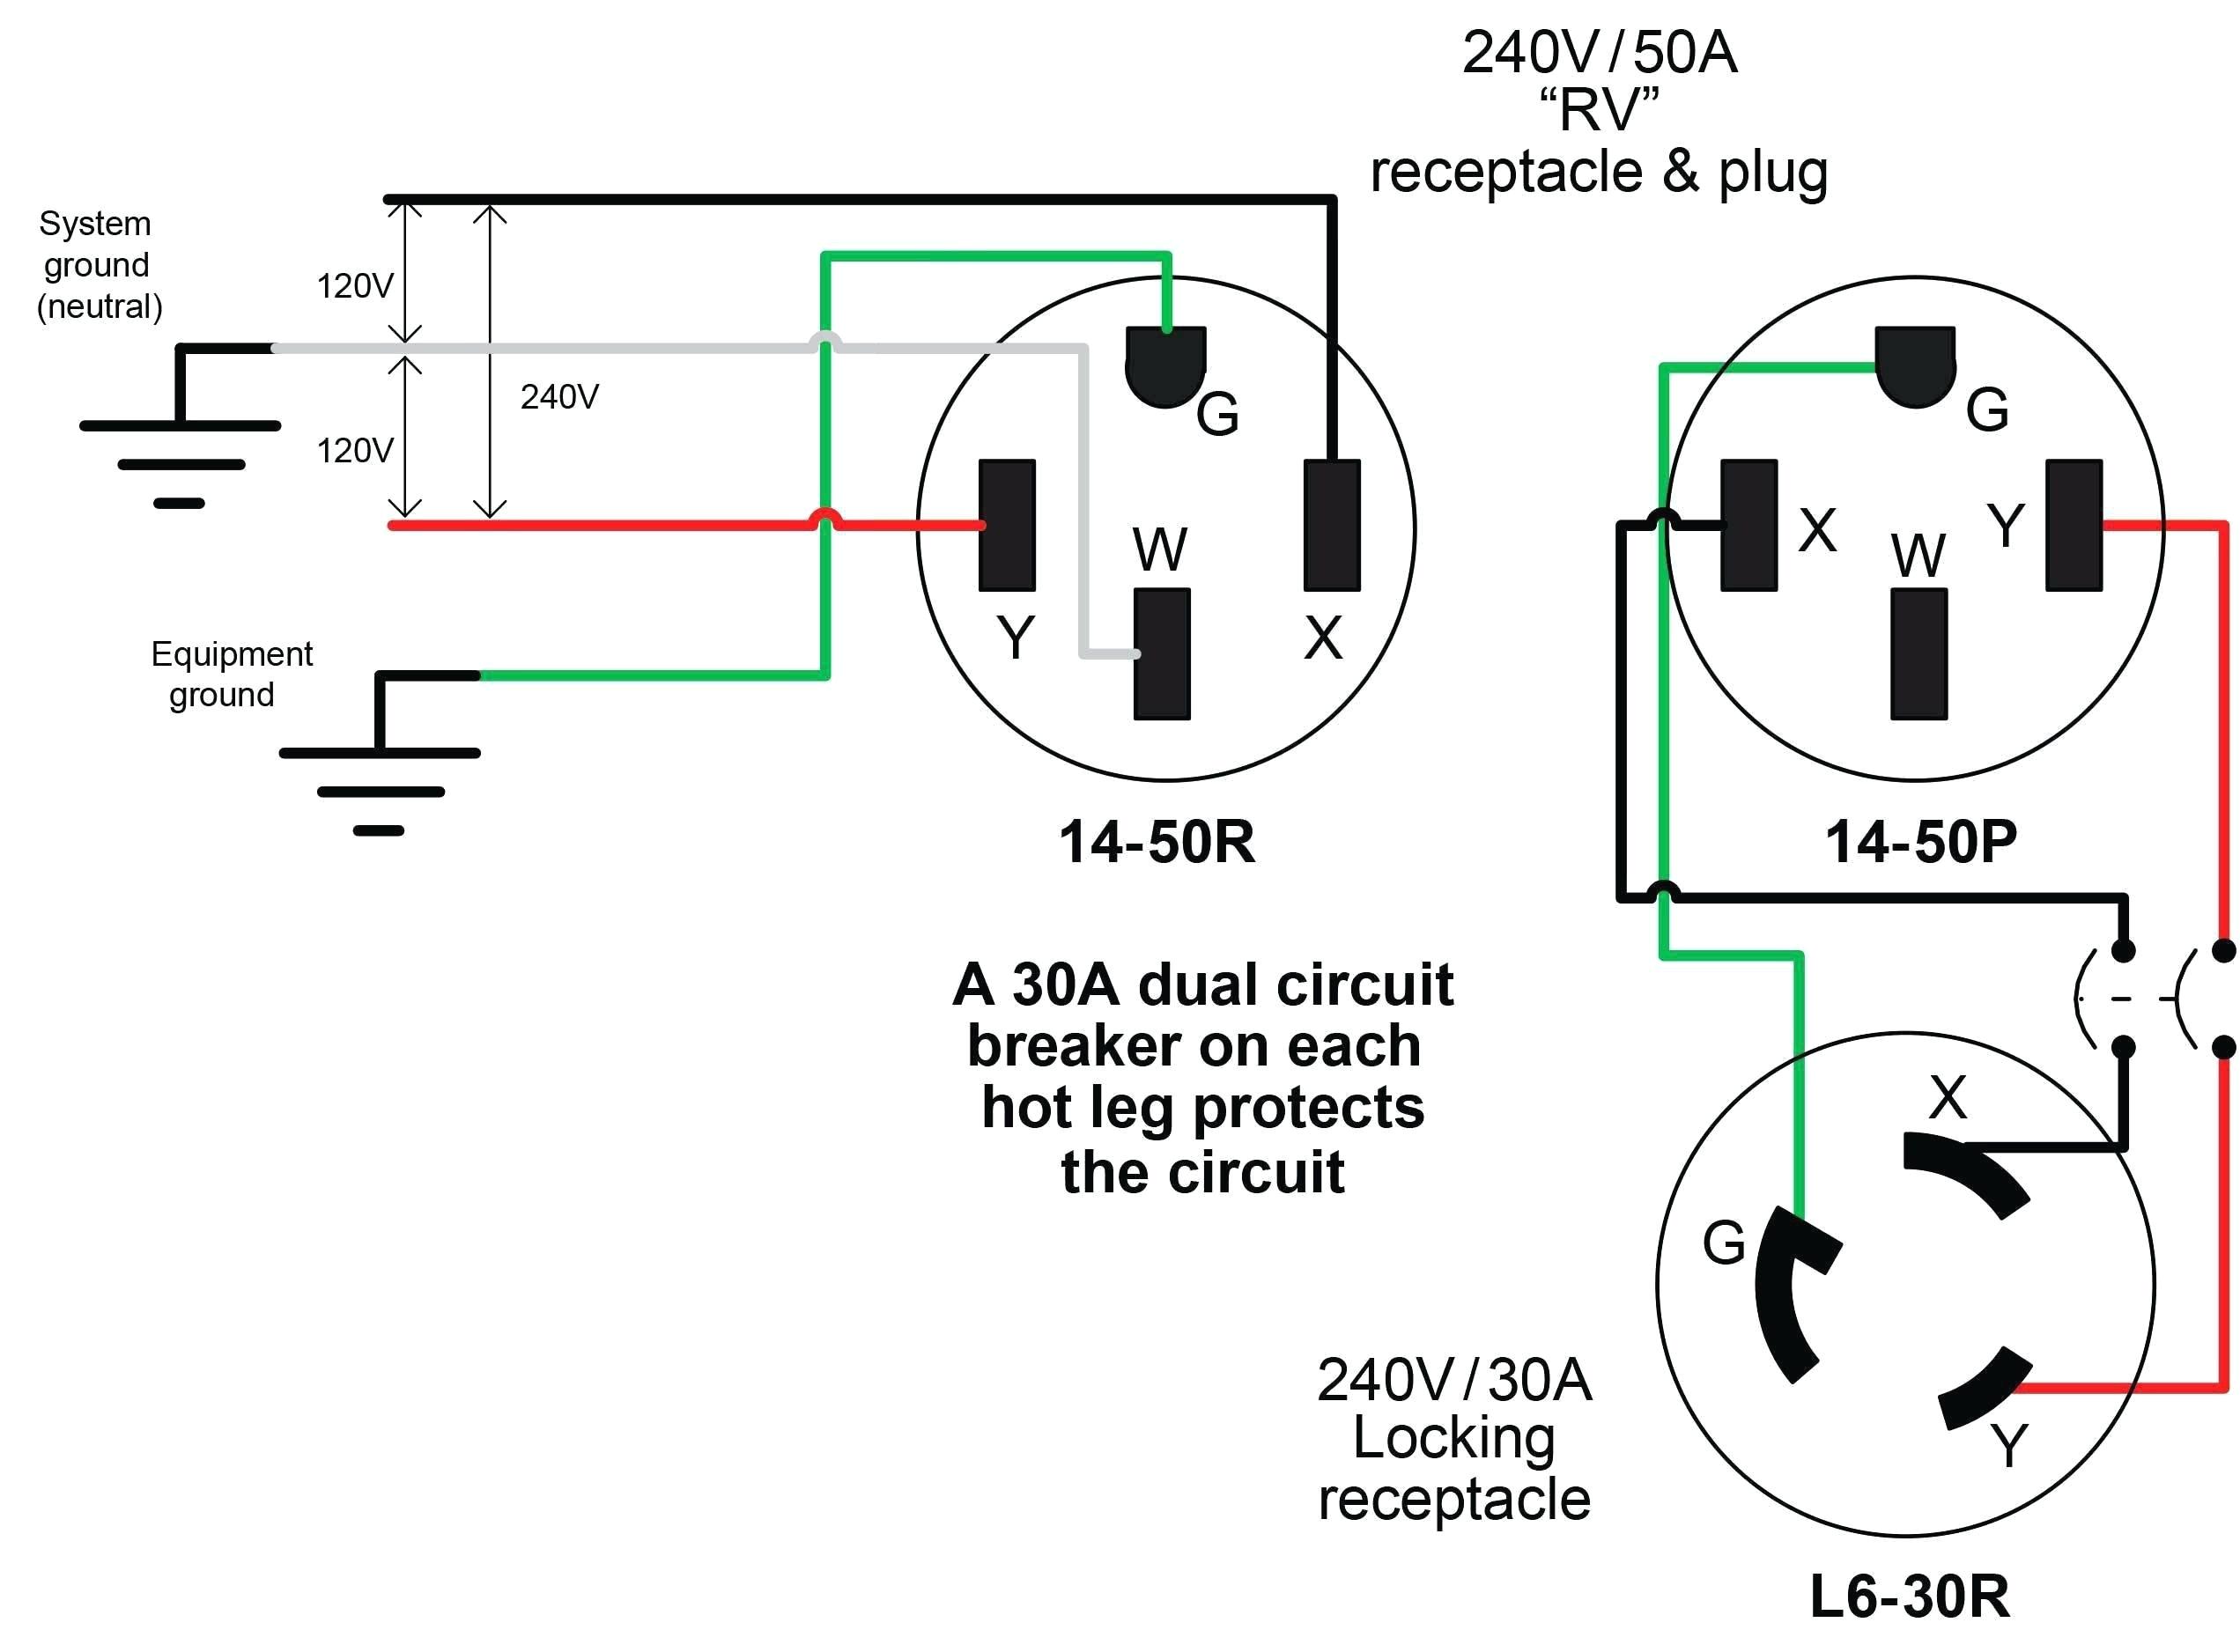 3 wire 220 plug diagram 4 wire plug wiring diagram wiring diagrams recent of 3 wire 220 plug diagram jpg